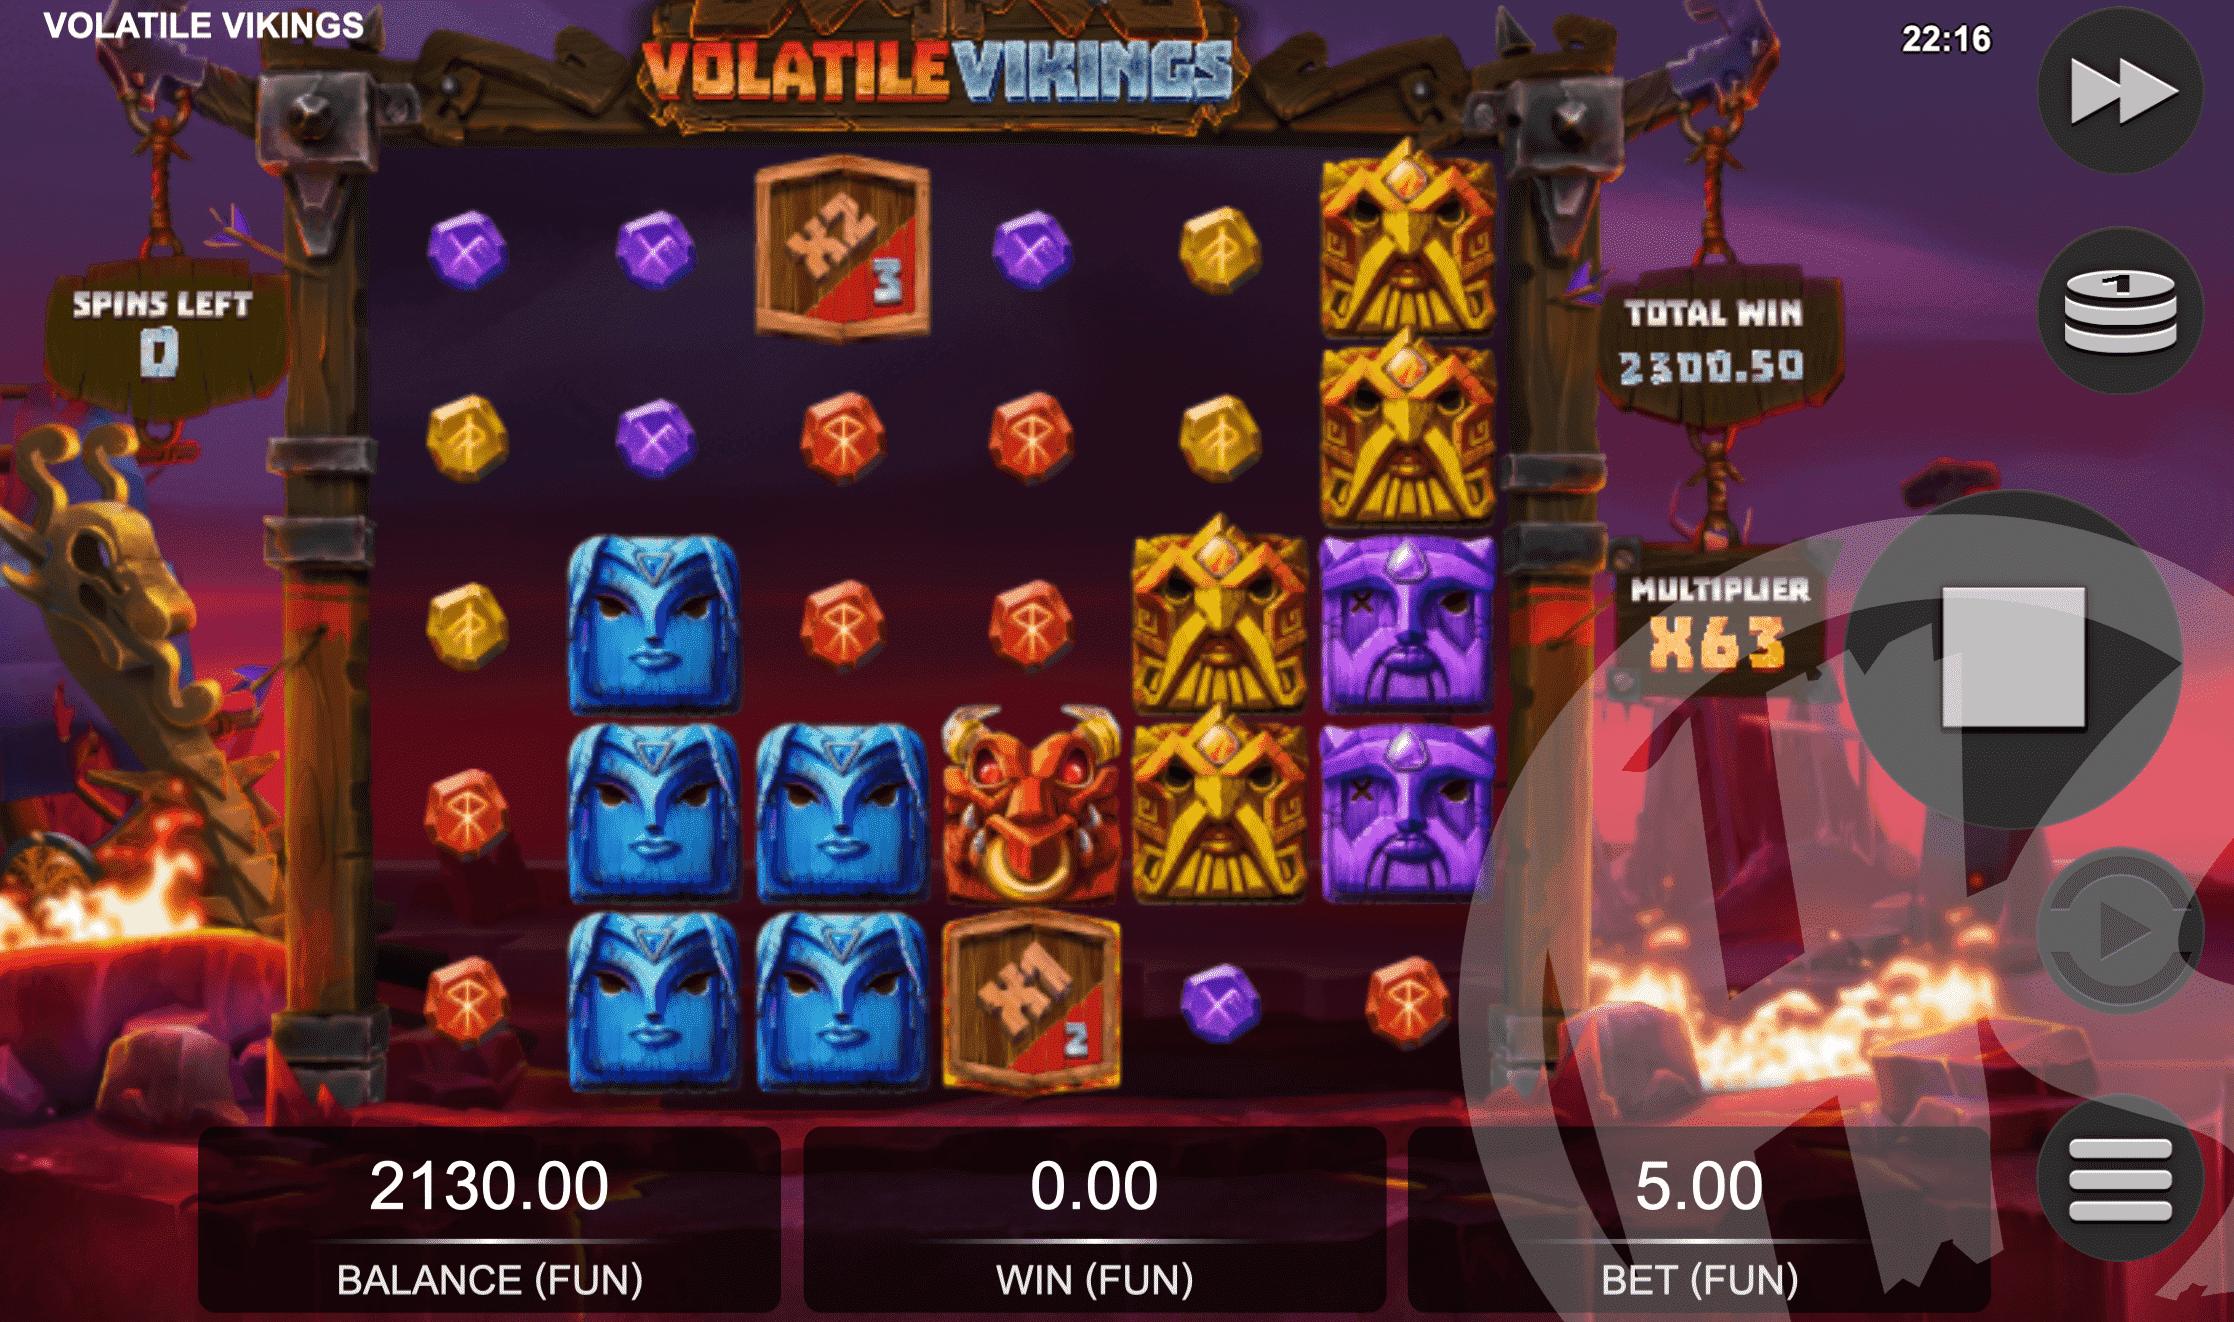 Volatile Vikings Free Spins